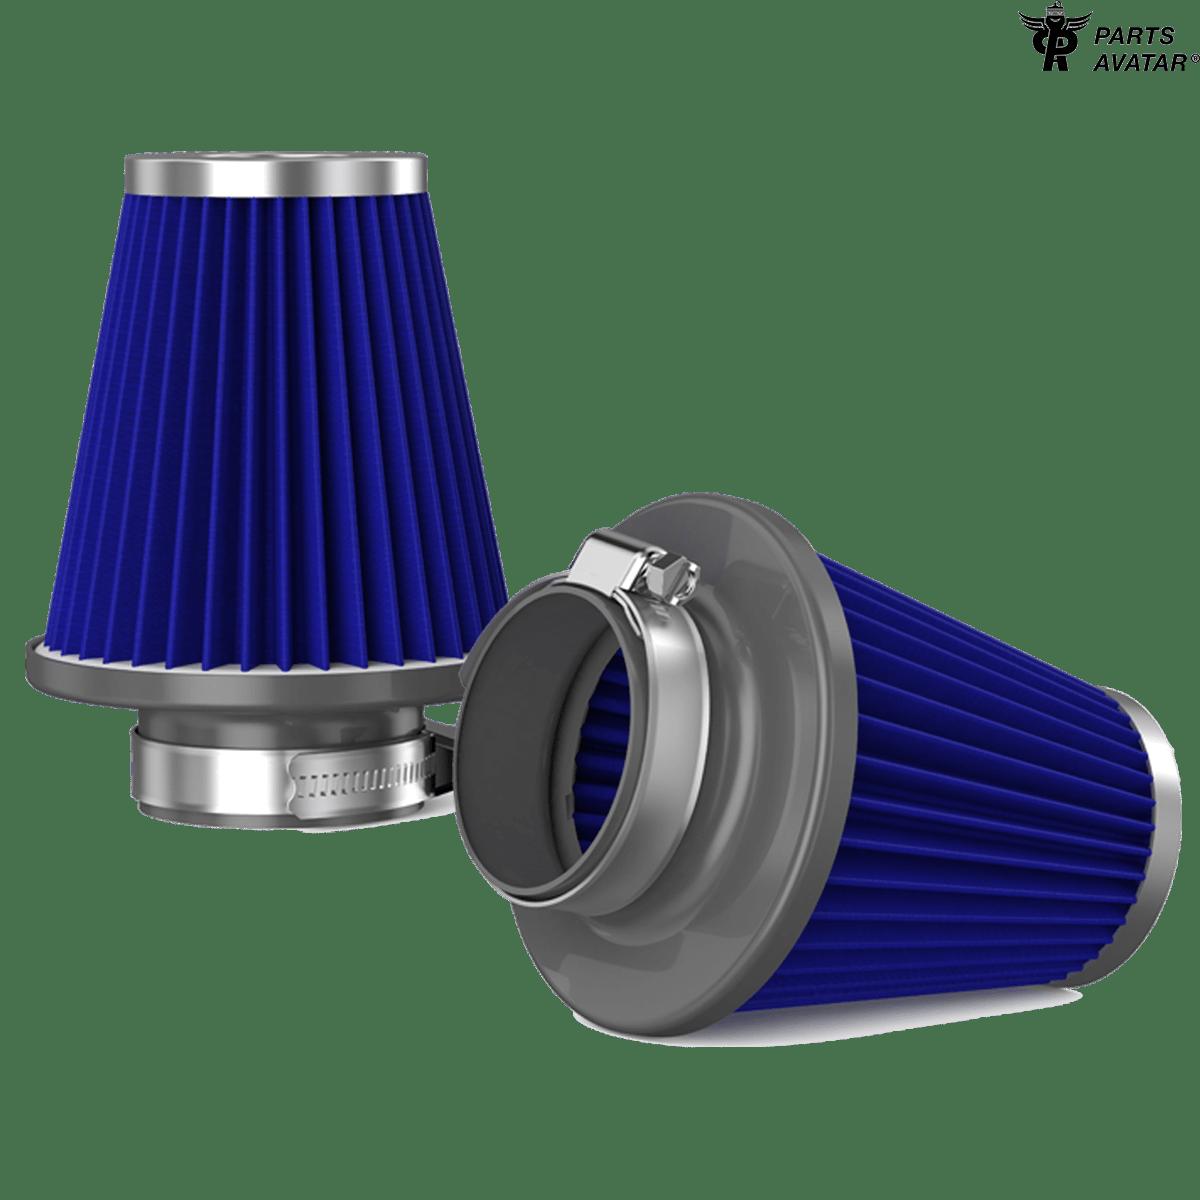 1.2. Gauze Air Filters